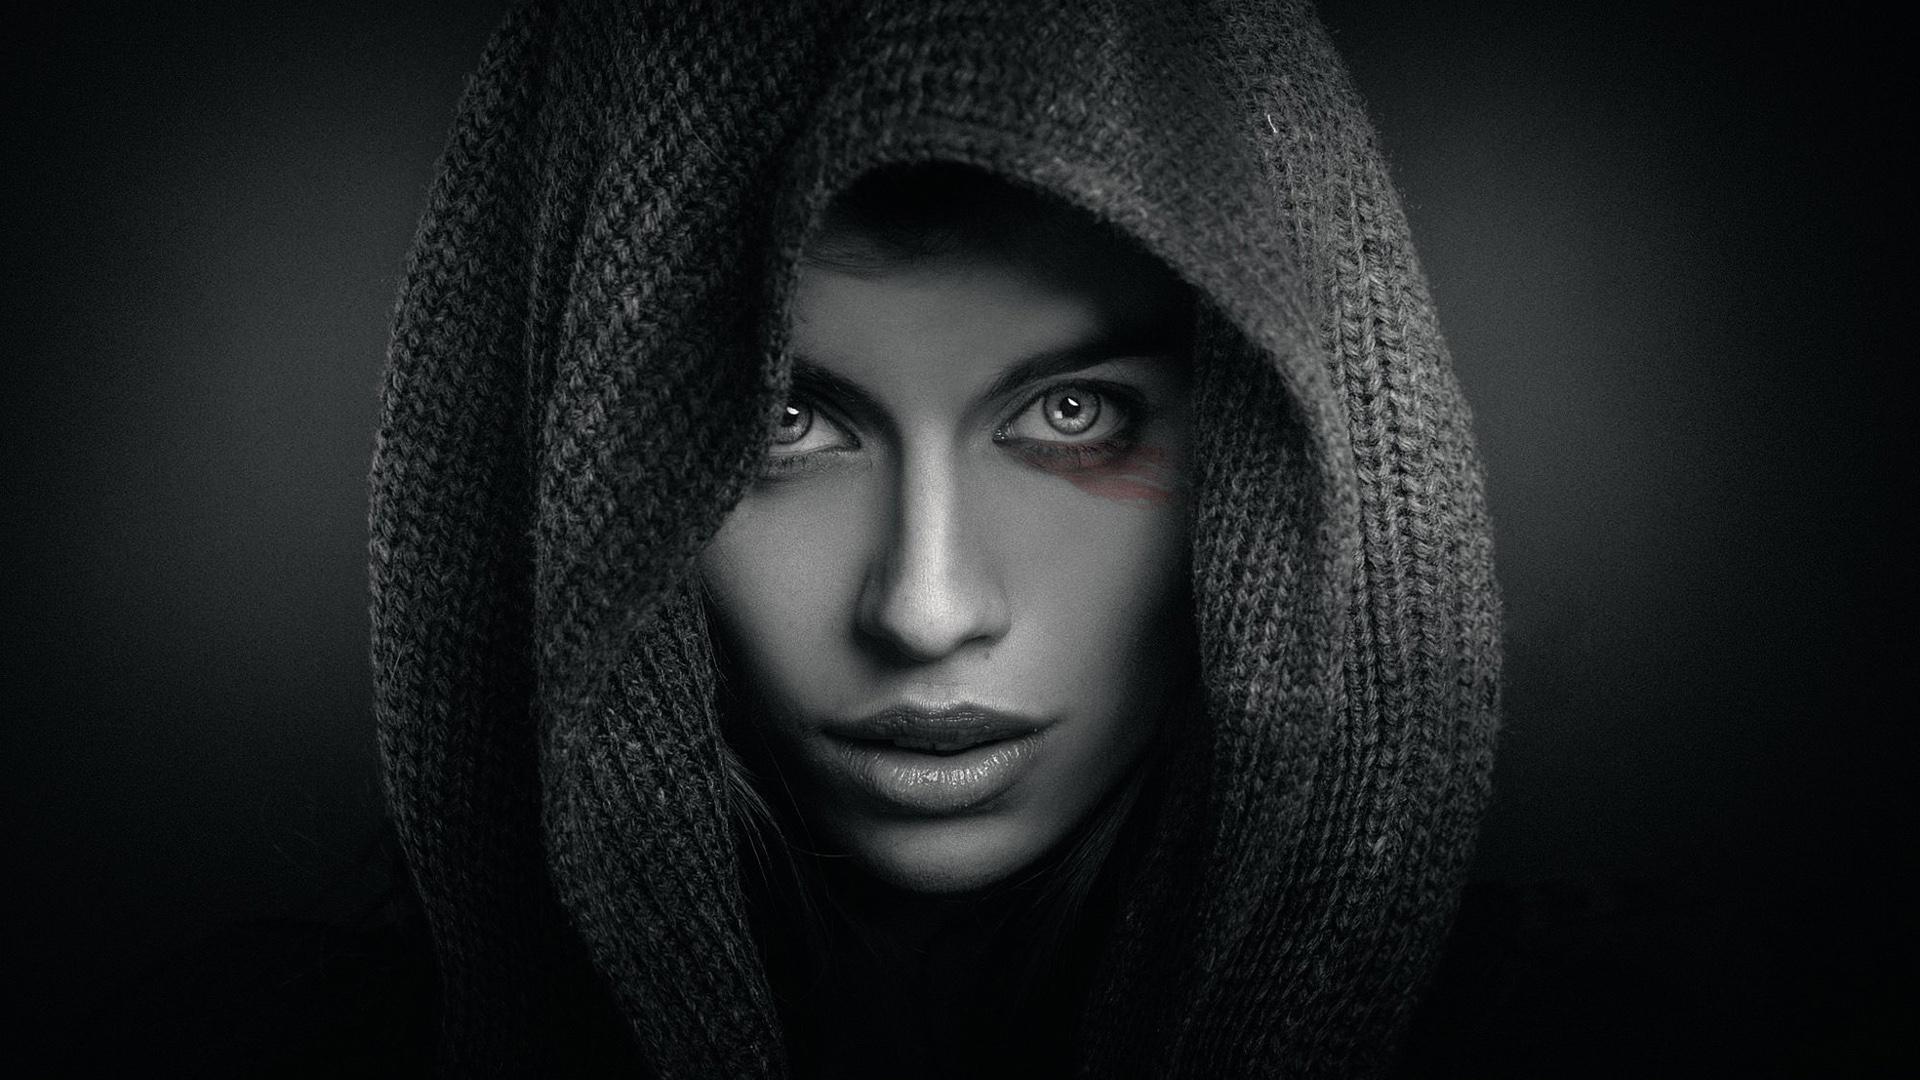 лица в черном фото картинки